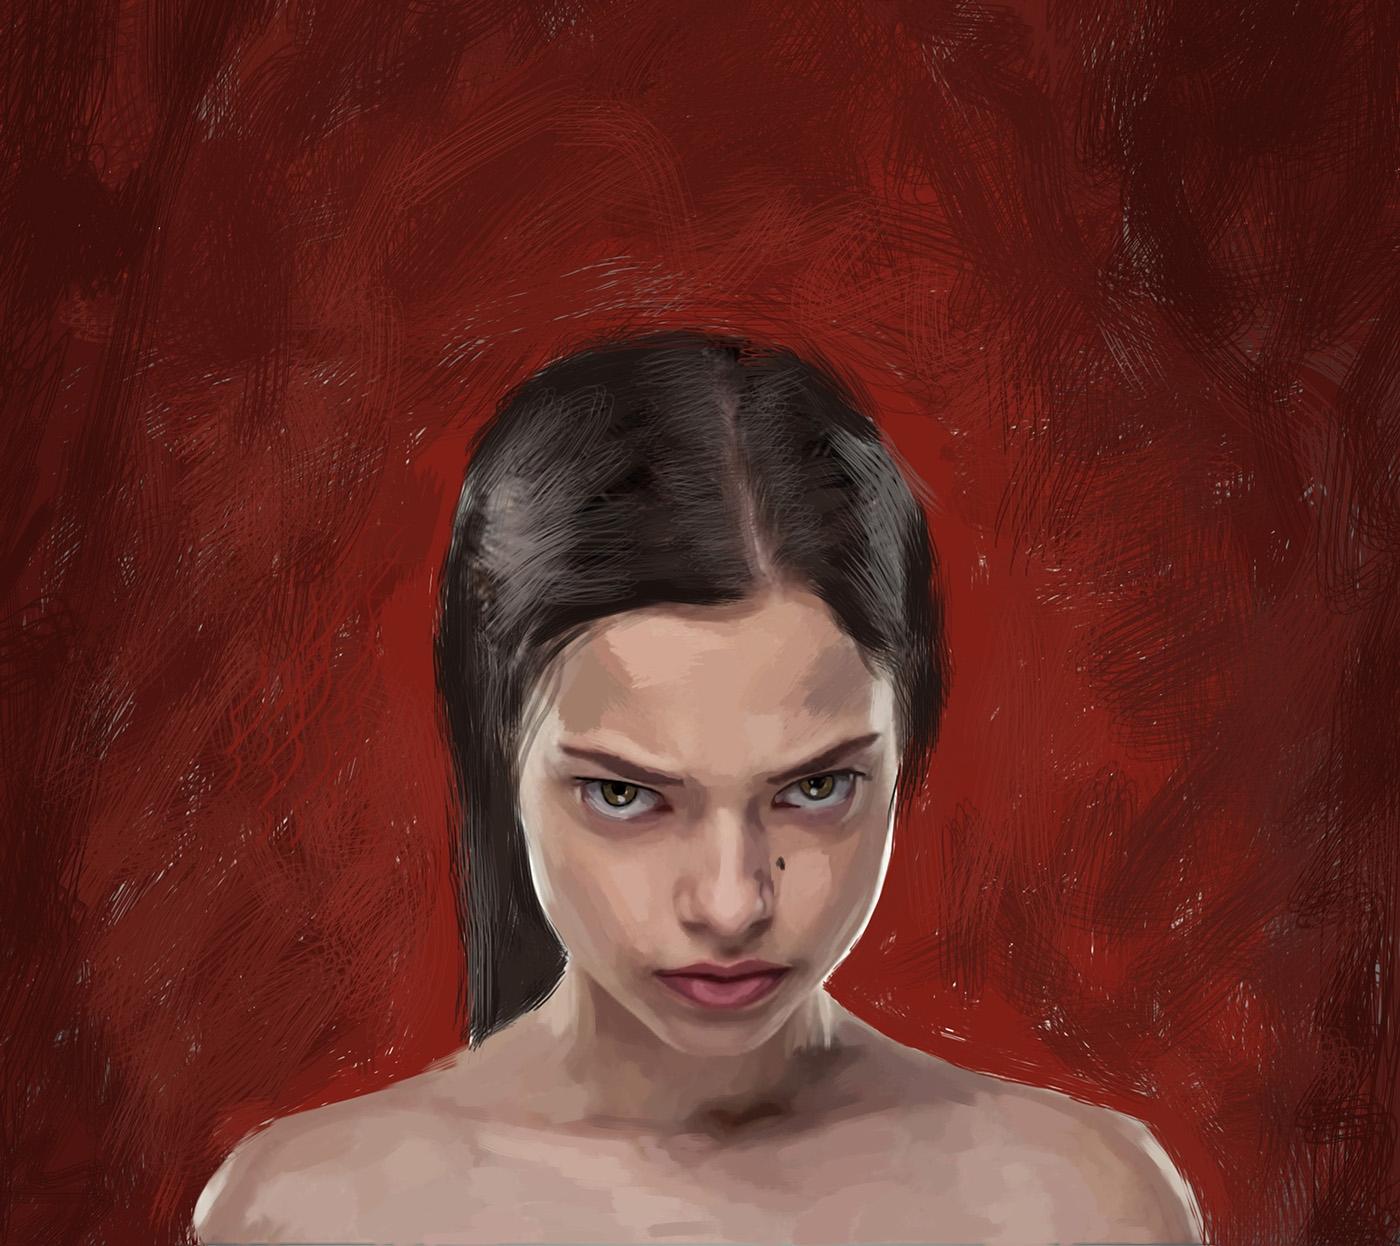 illustration, drawing, painting - anastasia_papad | ello